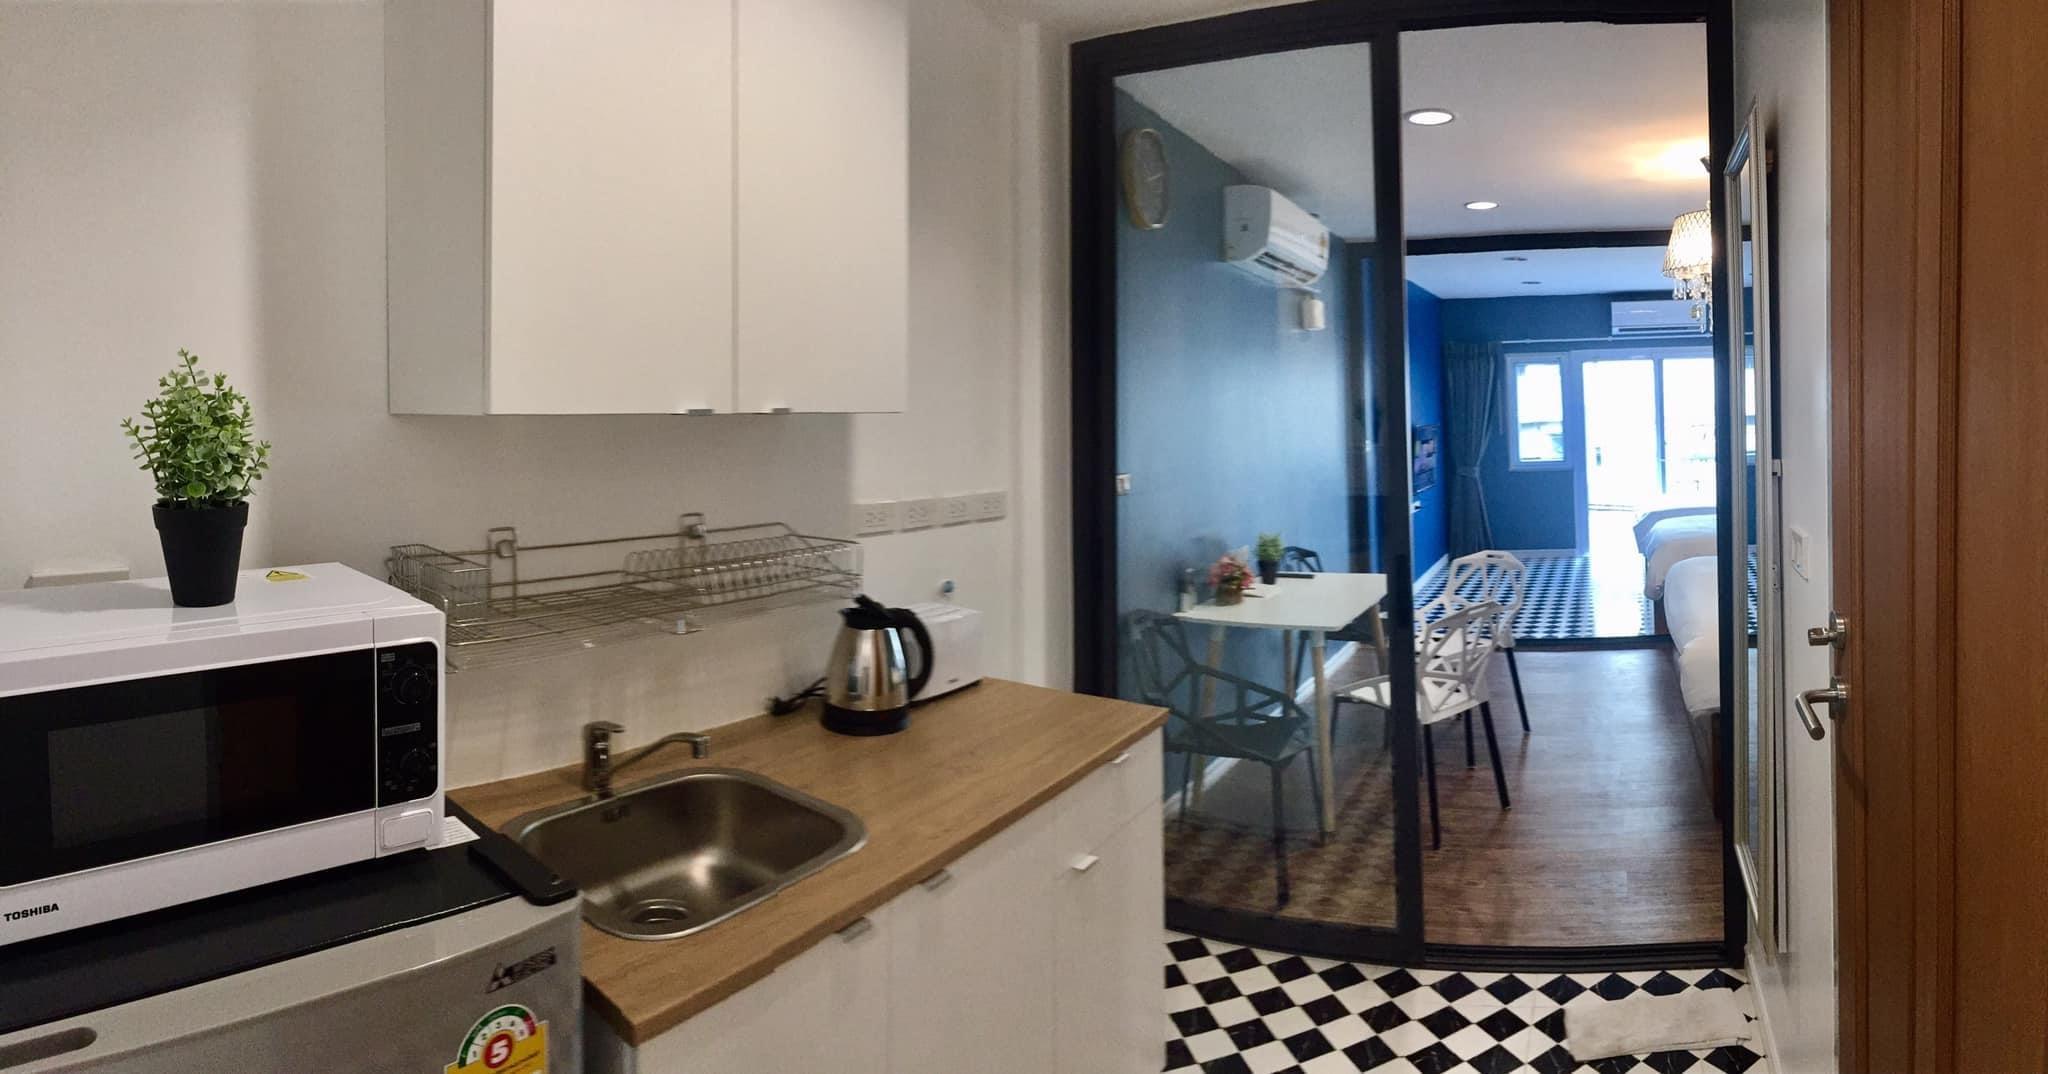 Bangkok Property Condo Apartment Real Estate For Rent in Phra Khanong Sukhumvit Shophouse in Phra Khanong